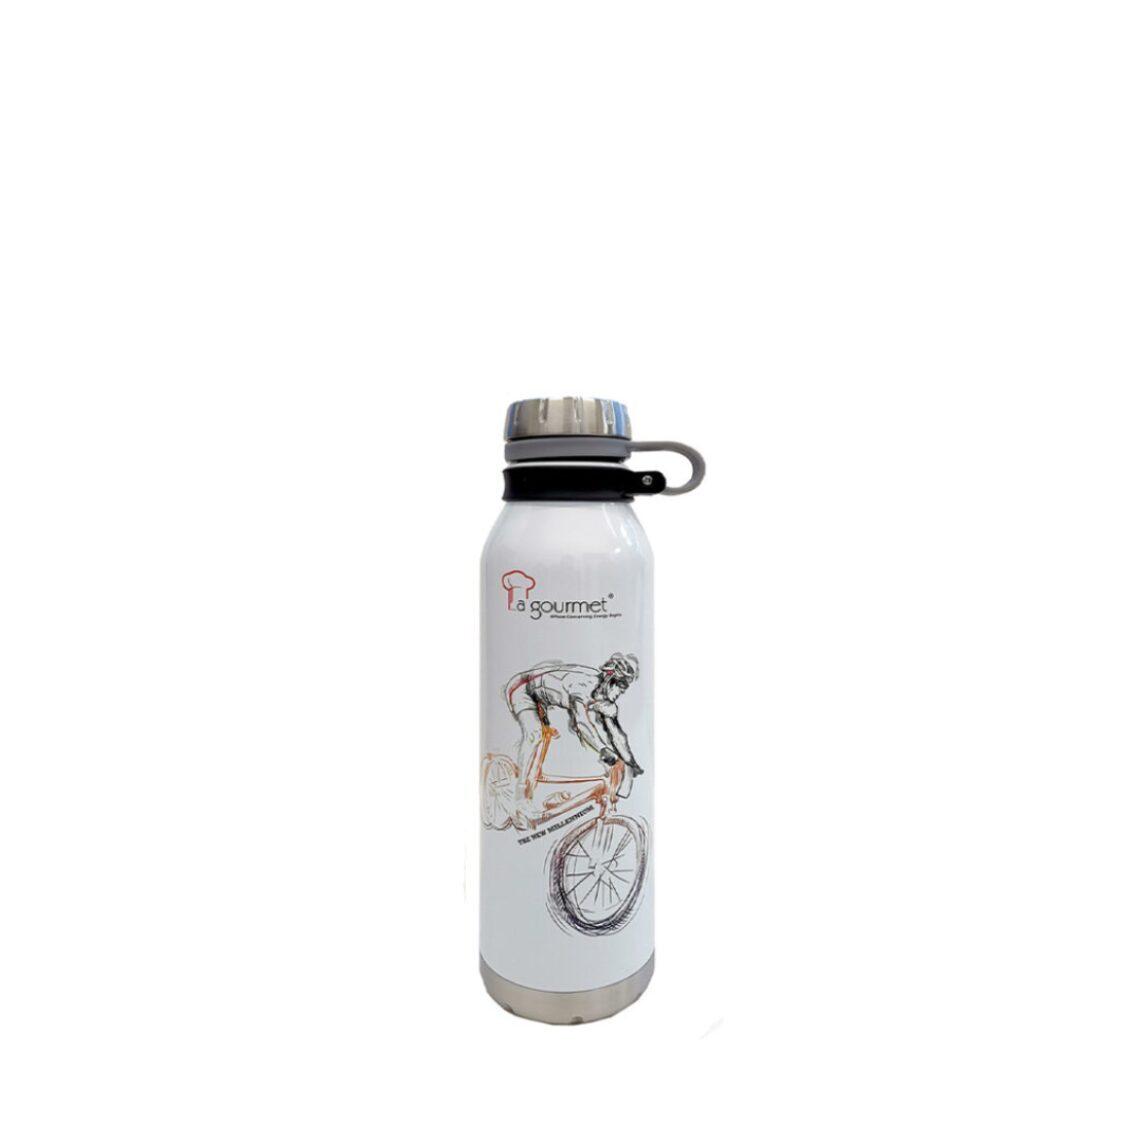 La Gourmet  Bicycle 075L Outdoor Thermal Flask LGBC356833